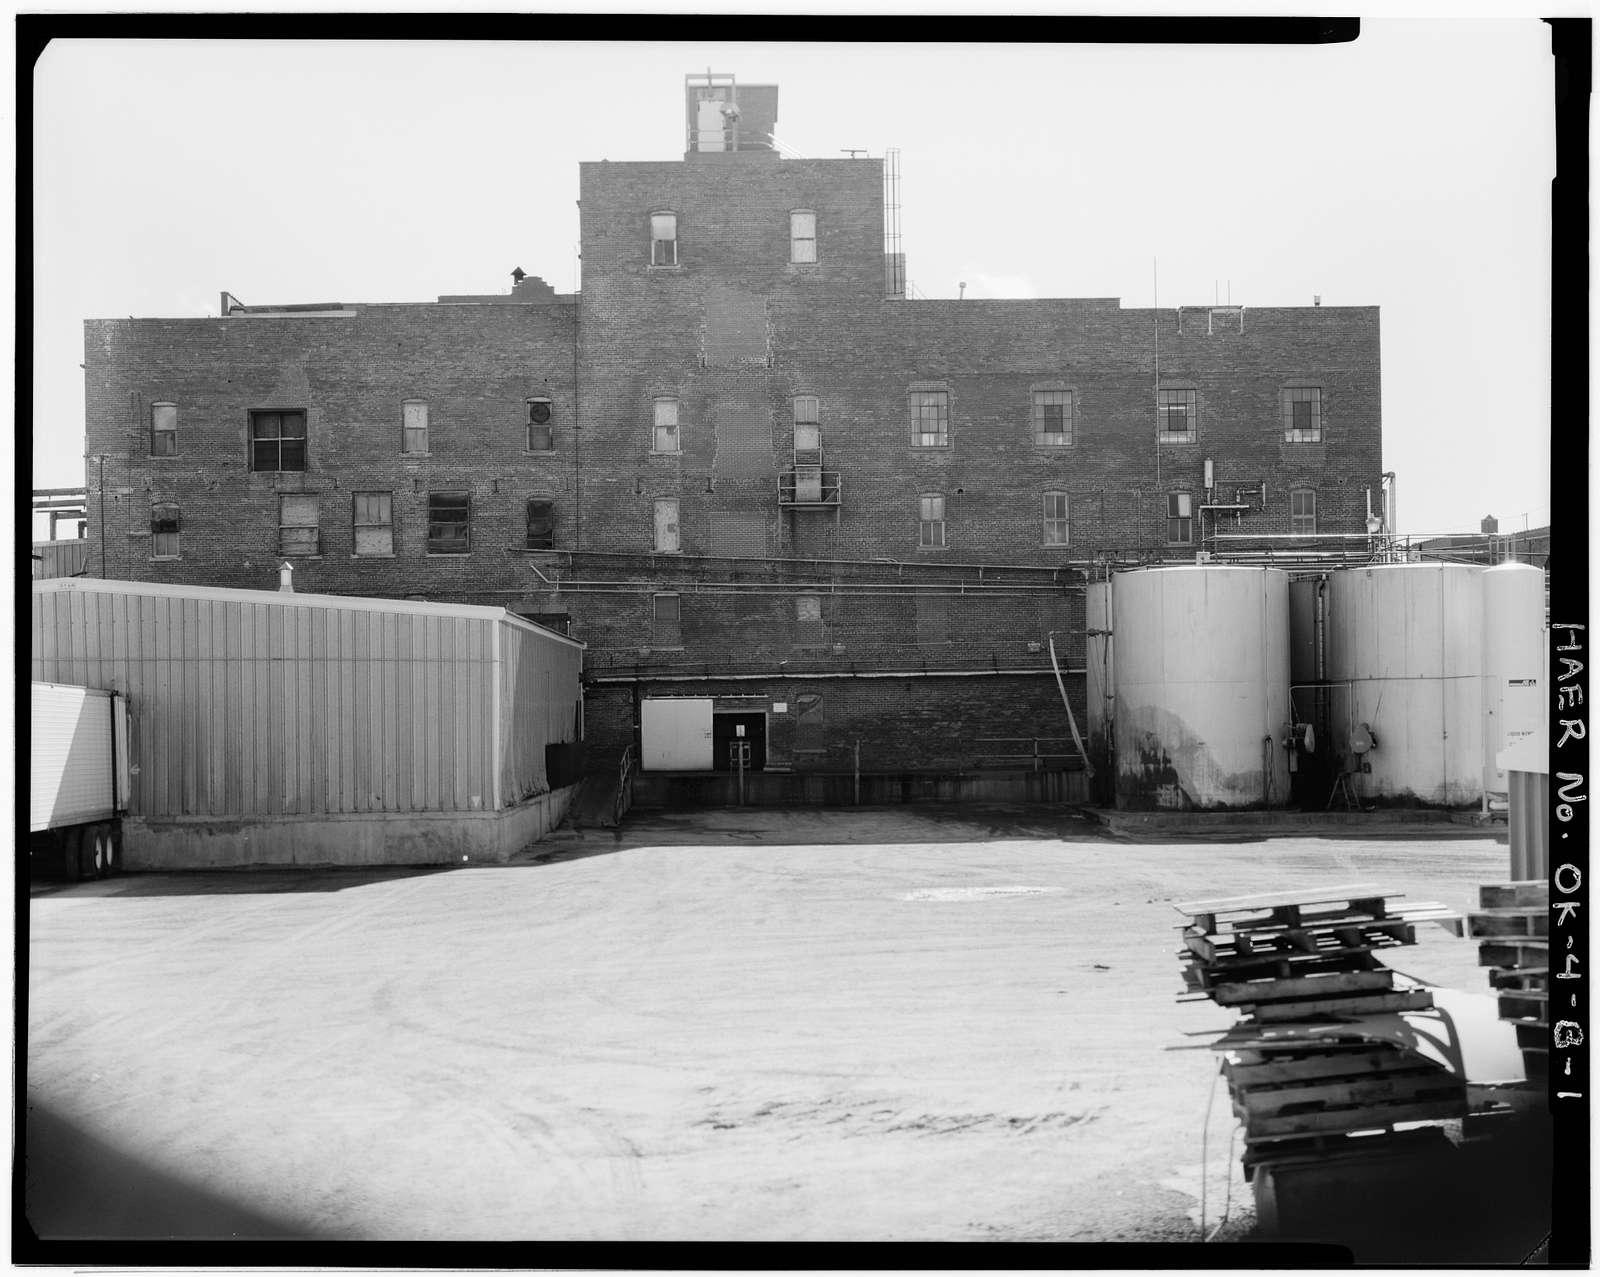 Wilson's Oil House, Lard Refinery, & Edible Fats Factory, Oil House, 2801 Southwest Fifteenth Street, Oklahoma City, Oklahoma County, OK